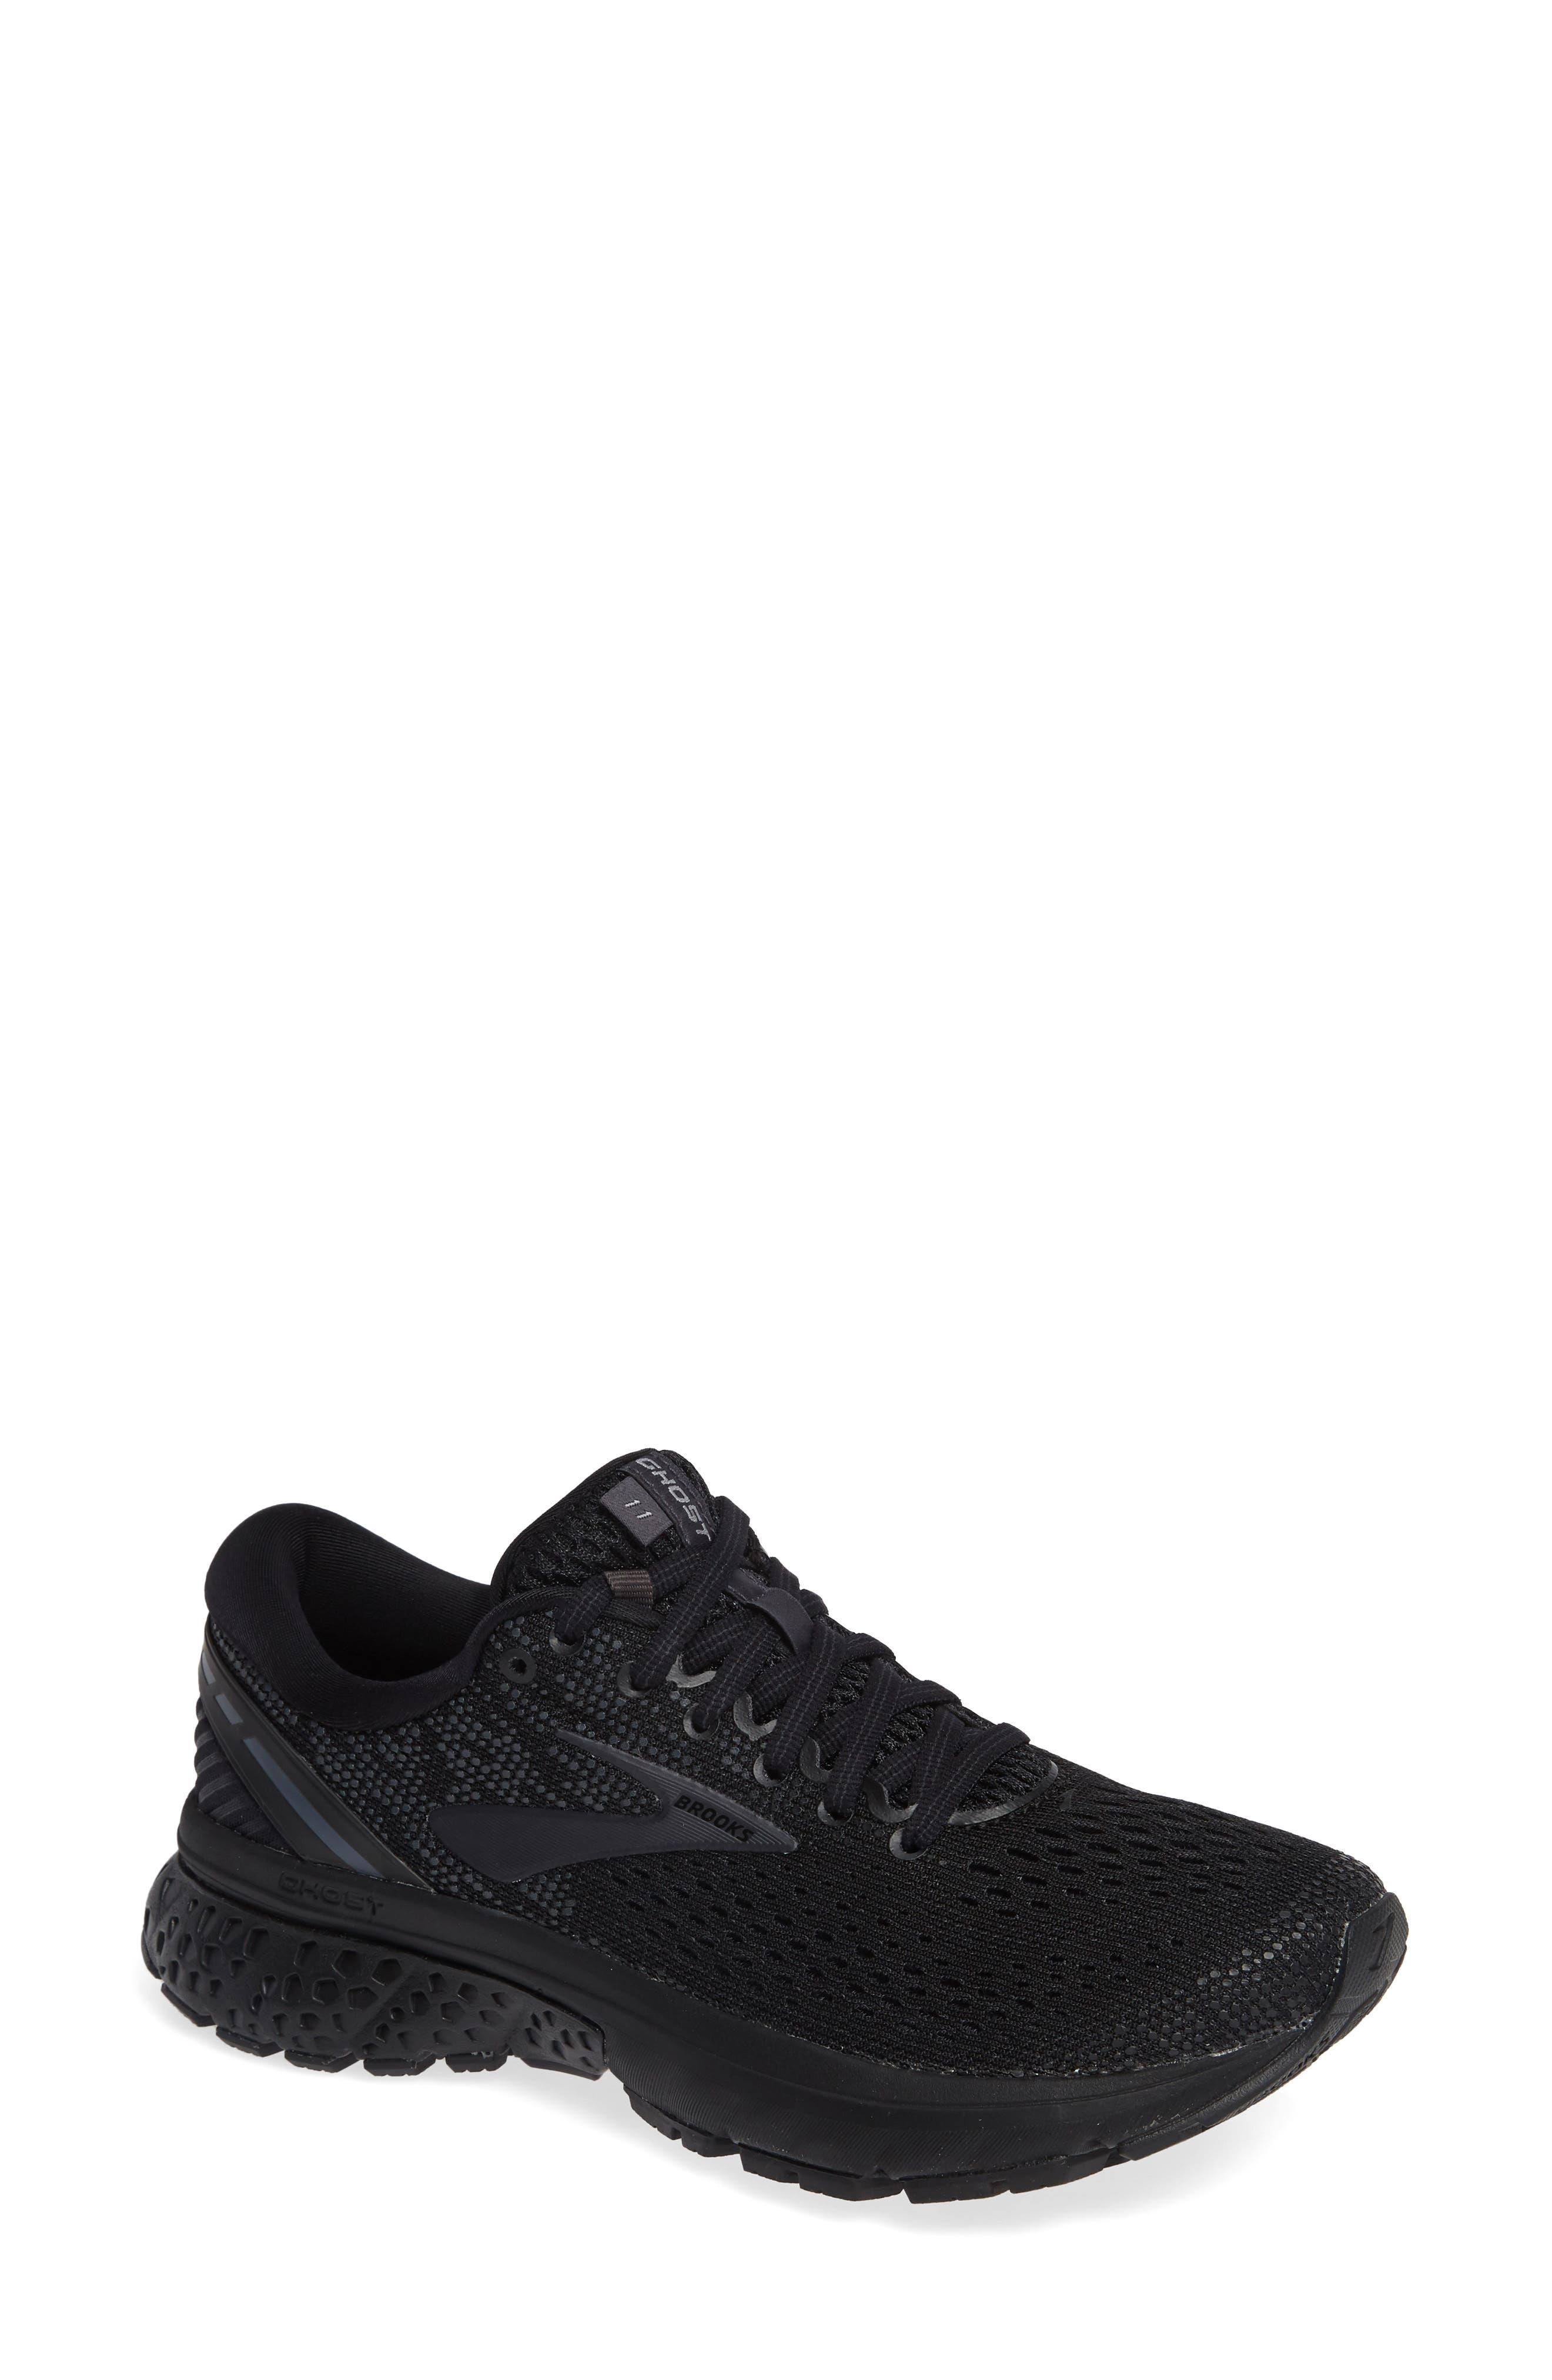 Brooks Ghost 11 Running Shoe, Black